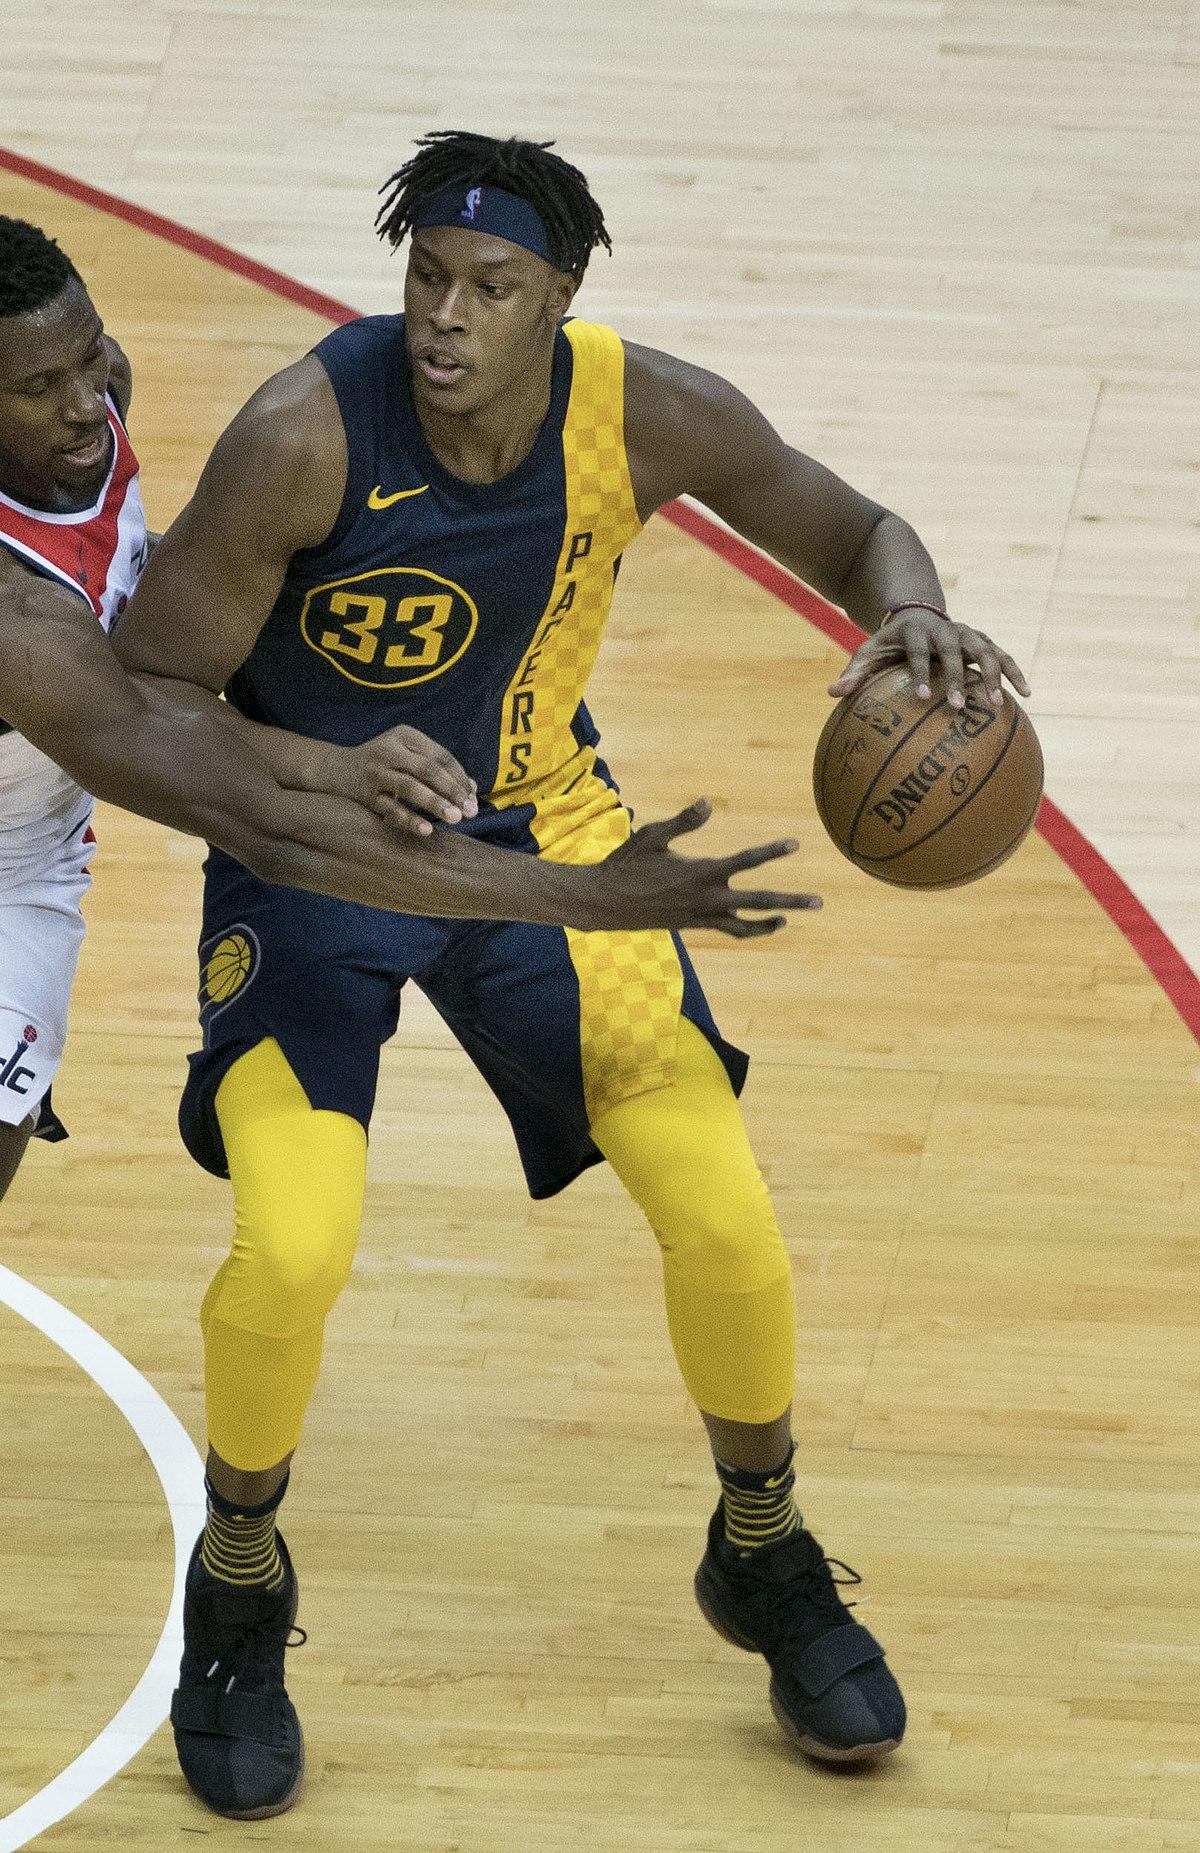 Myles Turner (basketball) - Wikipedia